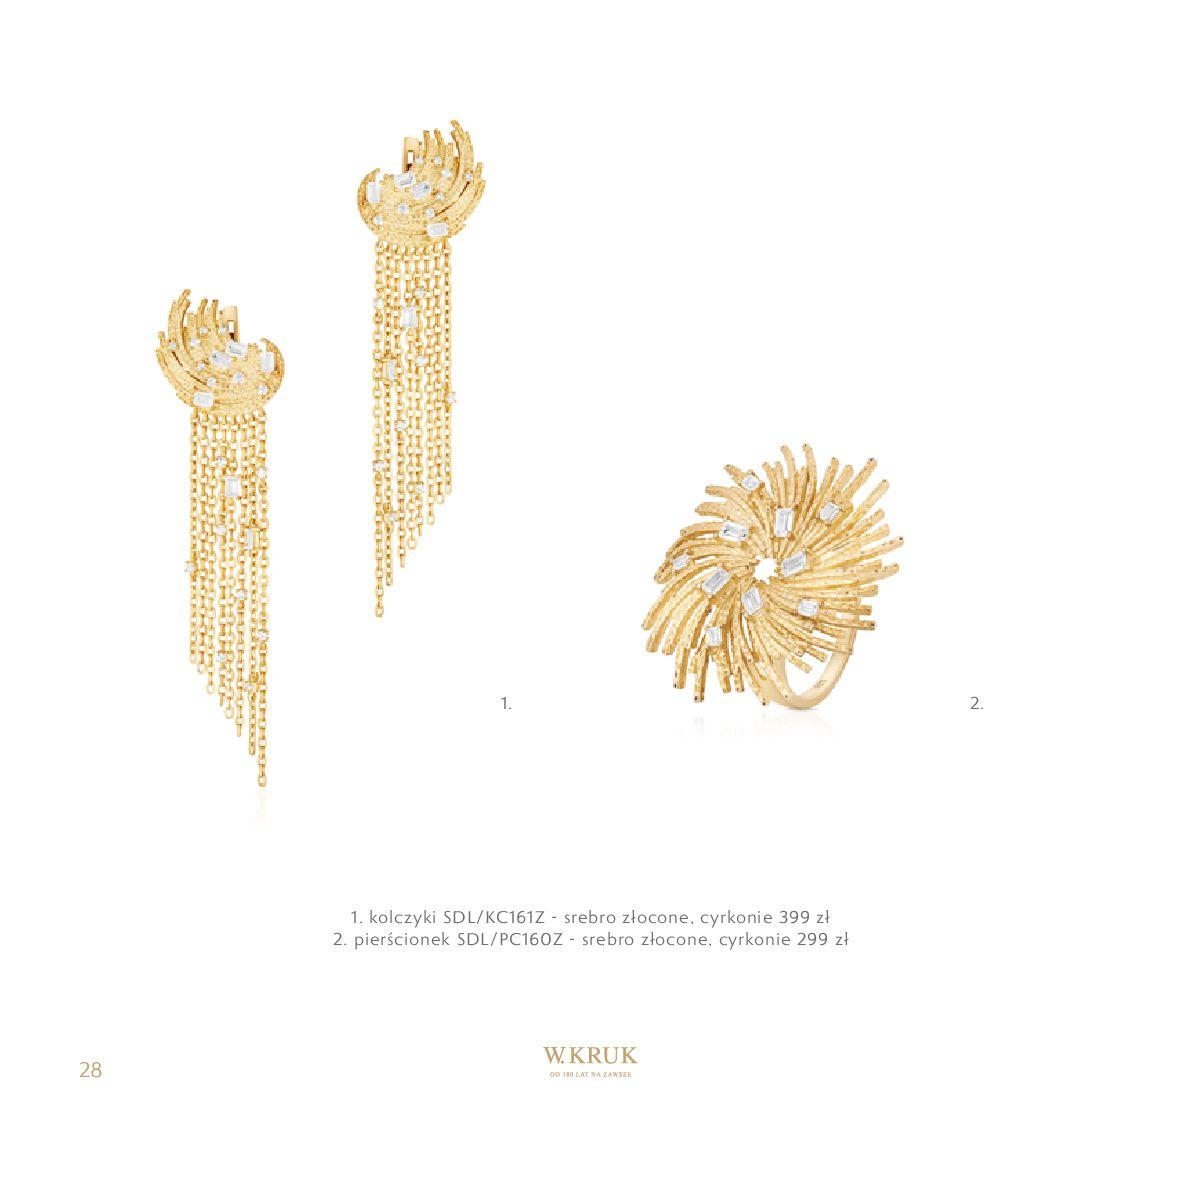 Gazetka W. KRUK: Katalog - Kolekcja Blask 2021-02-17 page-29